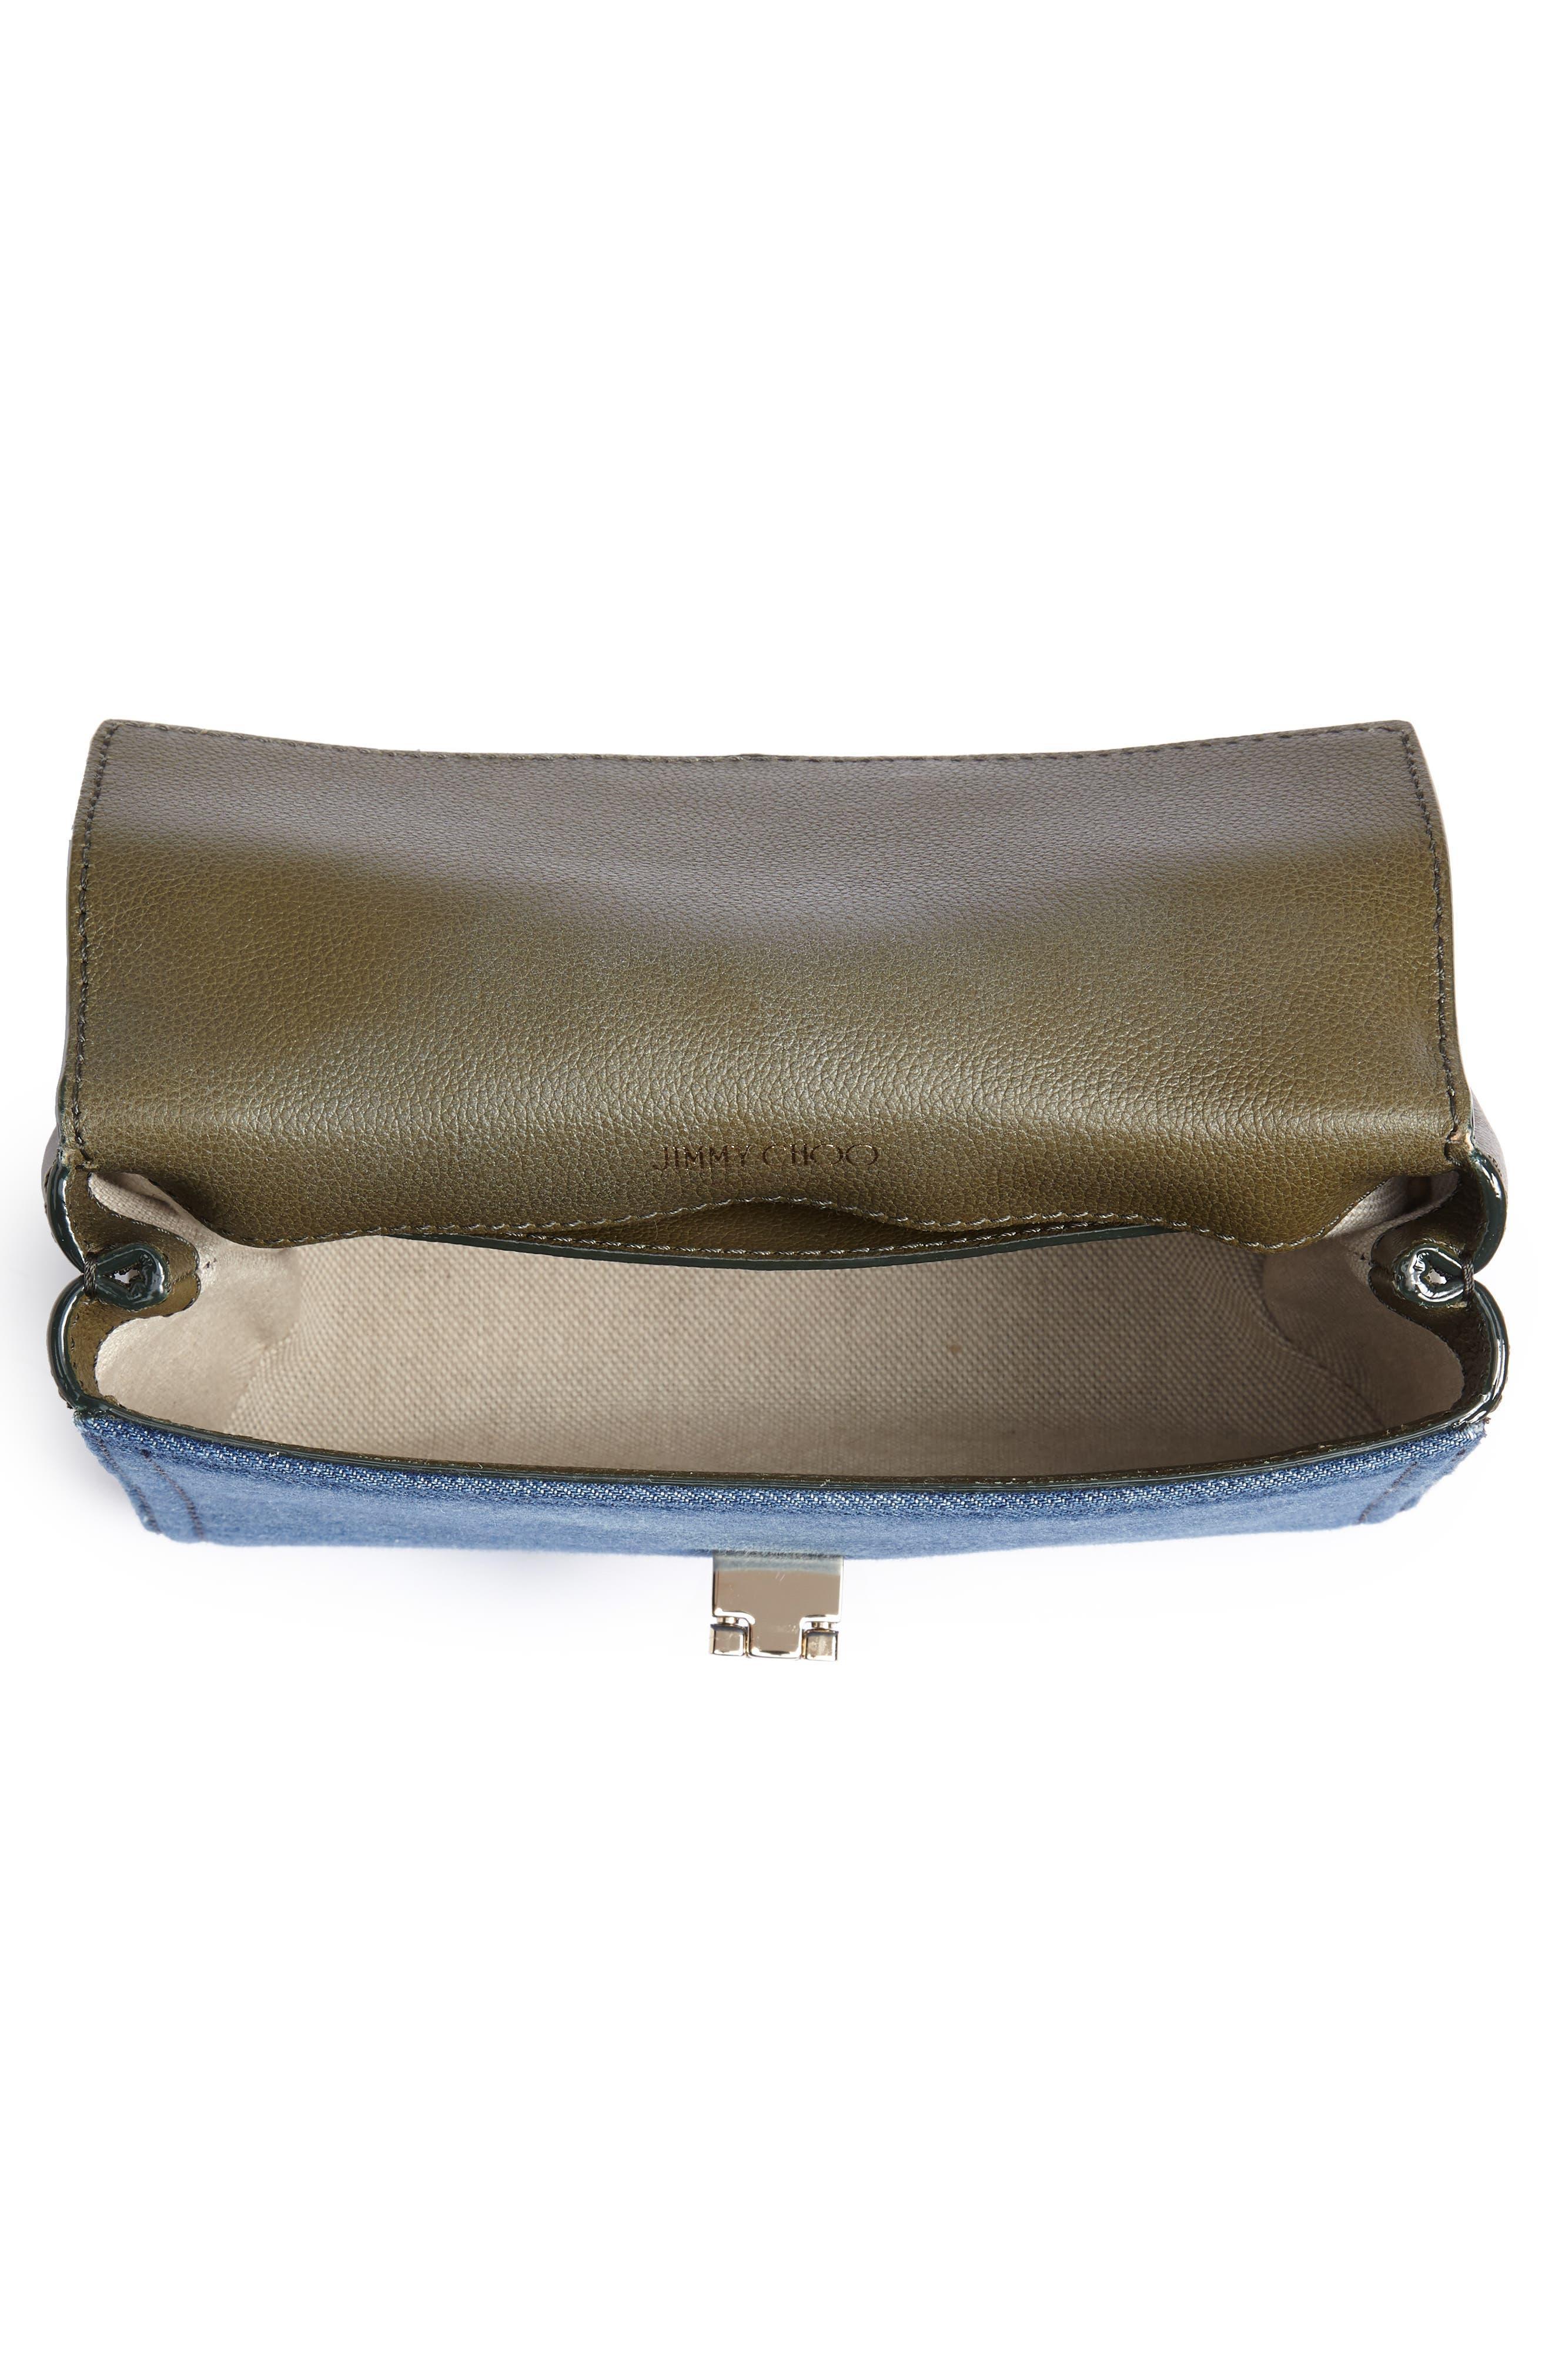 Marianne Leather & Genuine Snakeskin Crossbody Bag,                             Alternate thumbnail 5, color,                             NAVY MIX